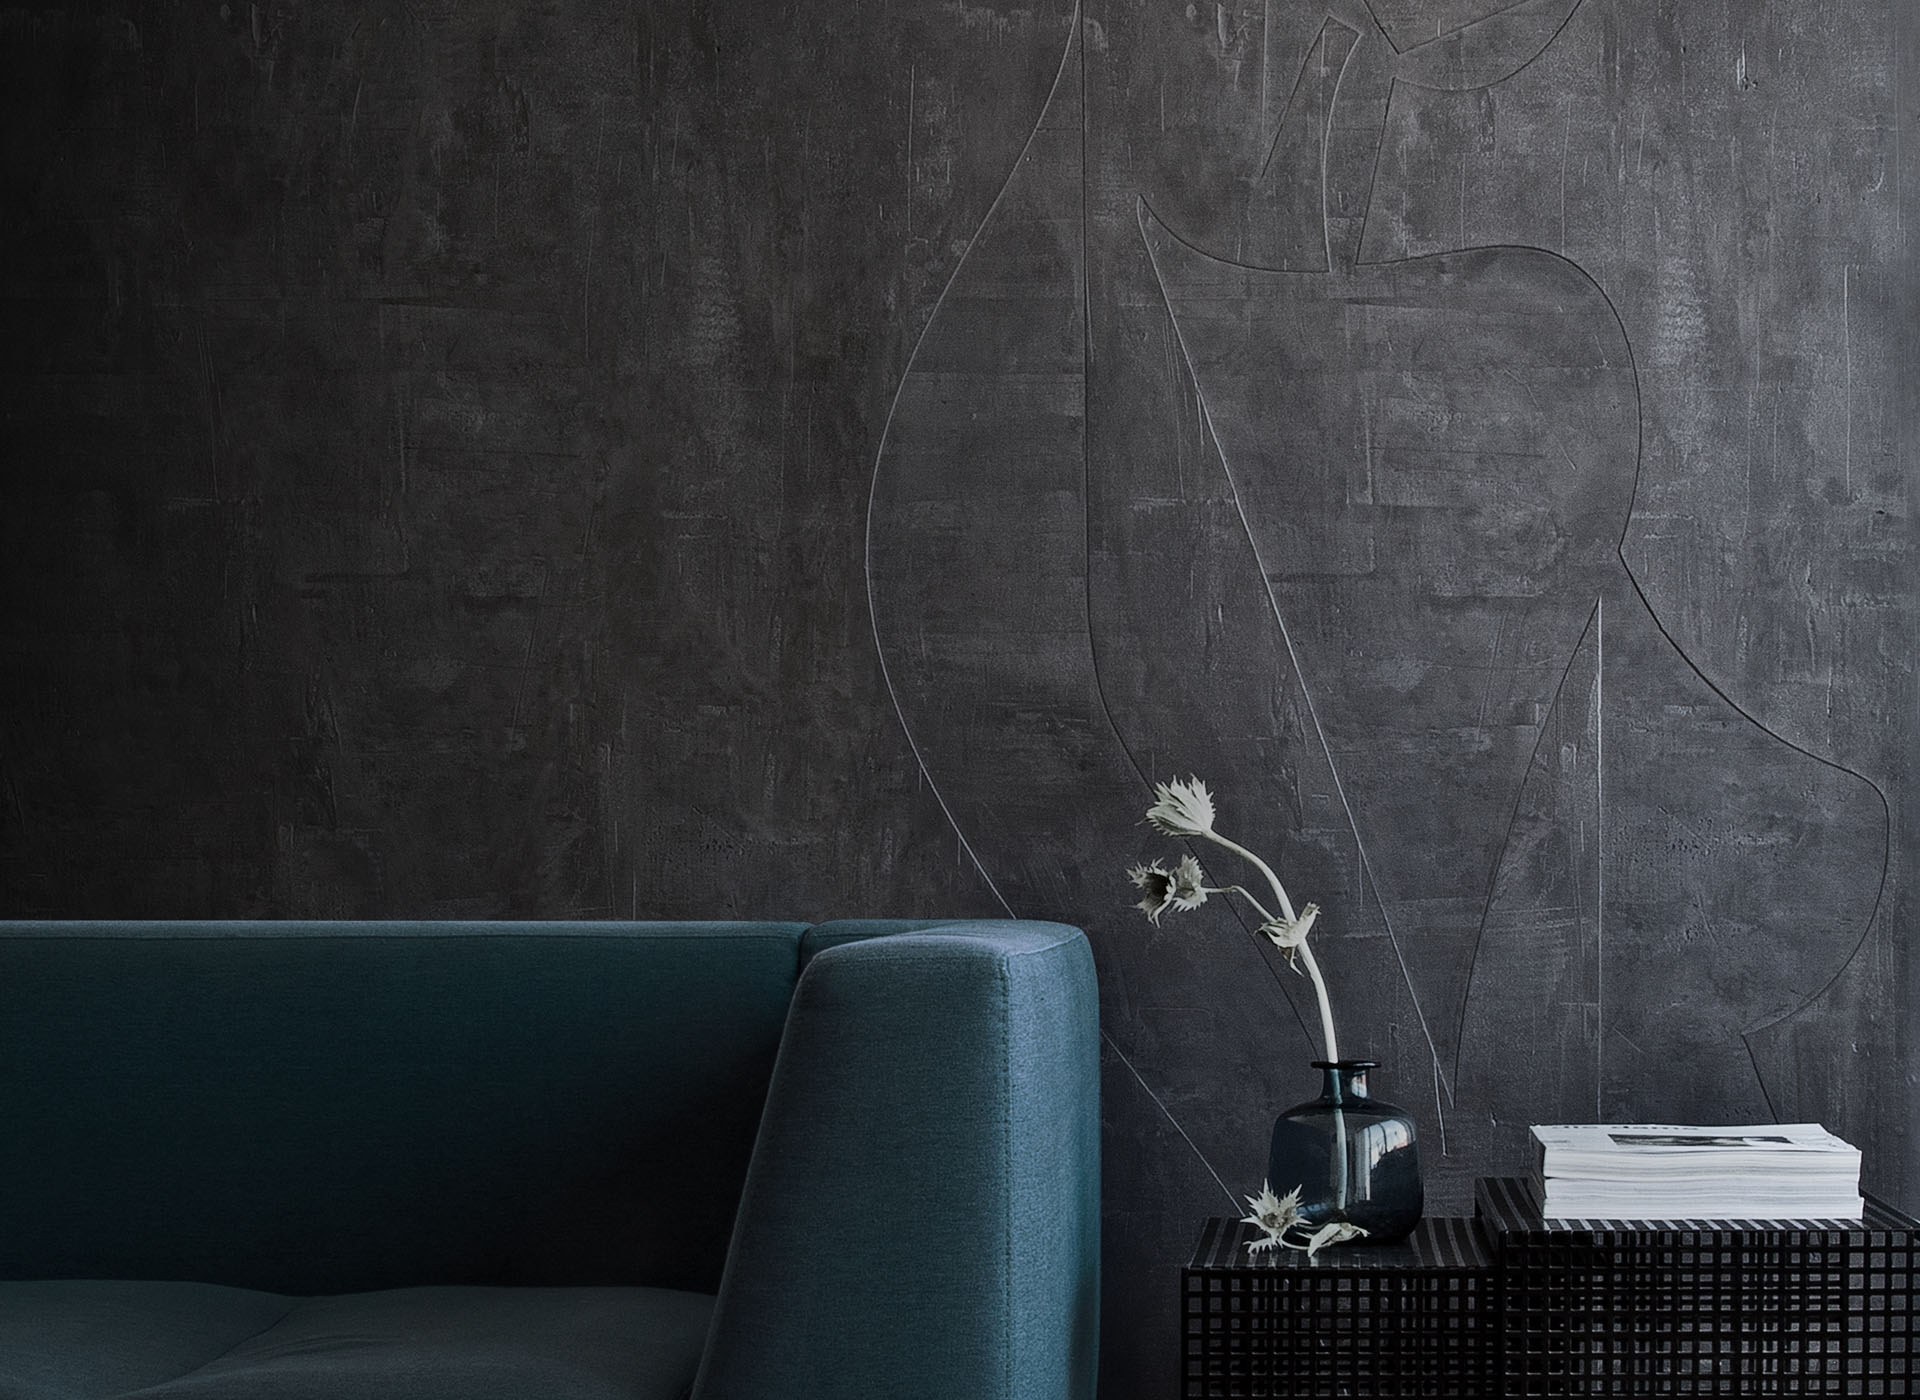 kalkputz trendy kalkputz with kalkputz gallery of hkalkputzh with kalkputz fabulous volimea. Black Bedroom Furniture Sets. Home Design Ideas